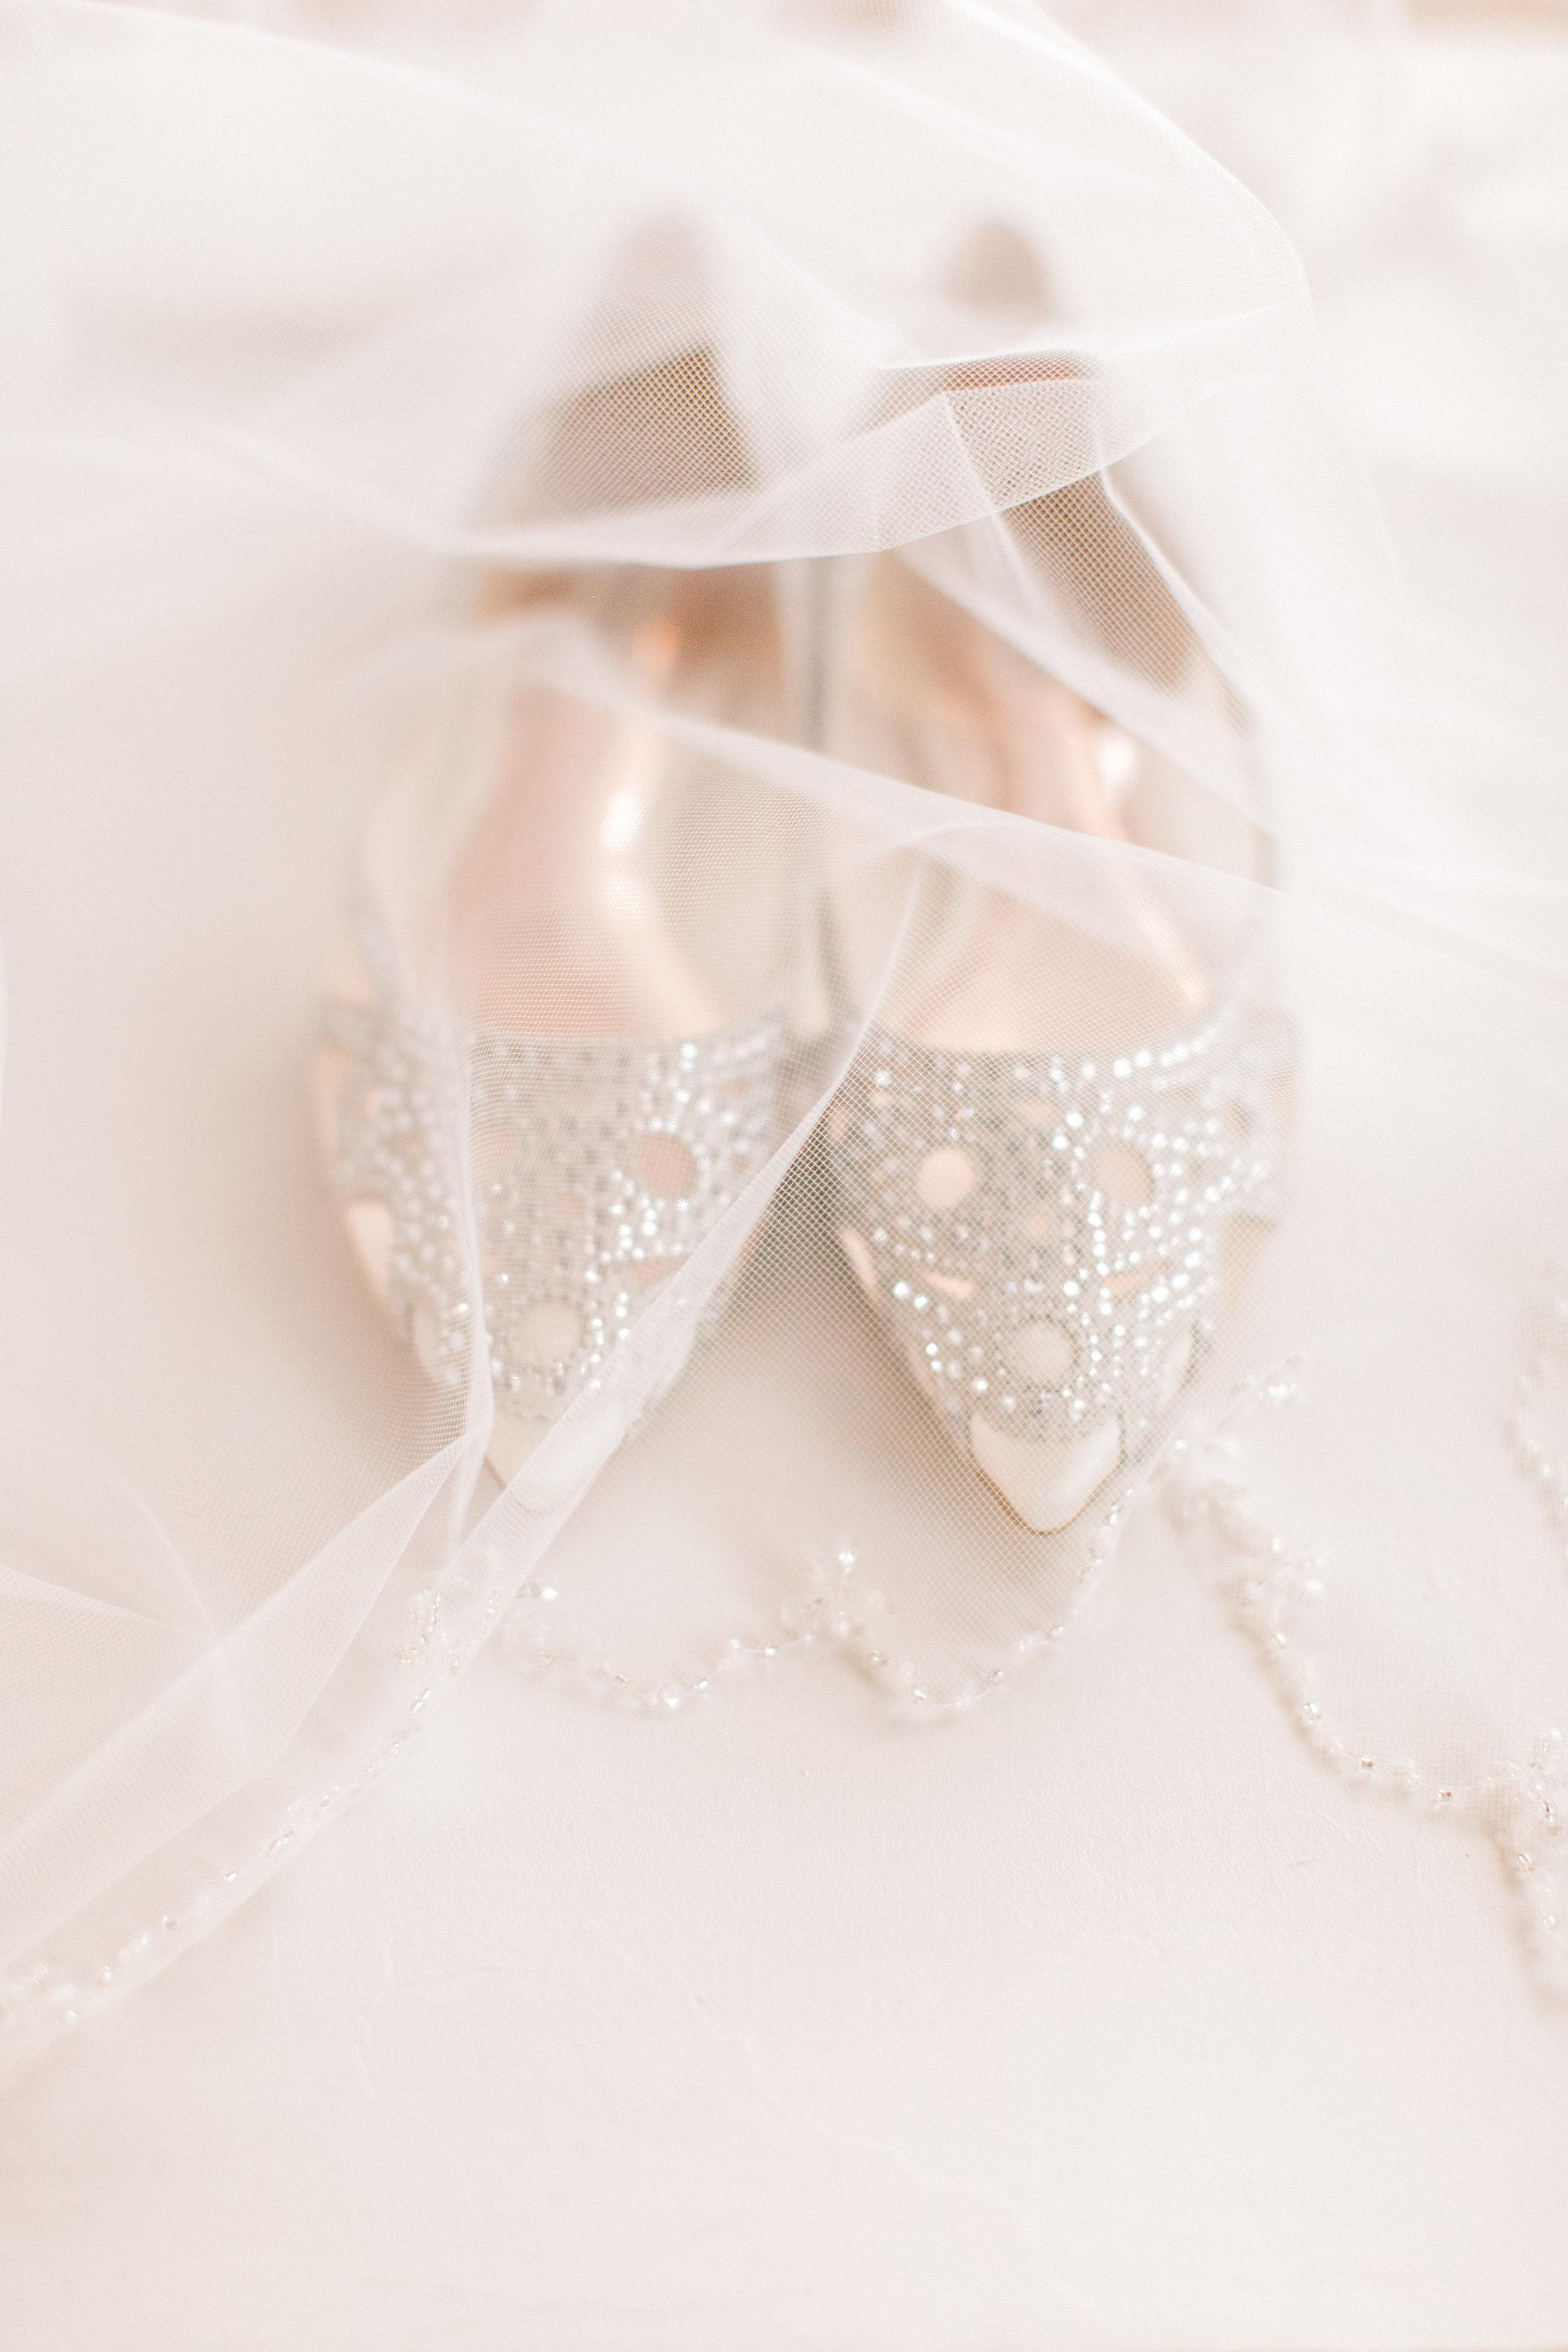 Ryan Alexa Married-Getting Ready First Look-0026.jpg